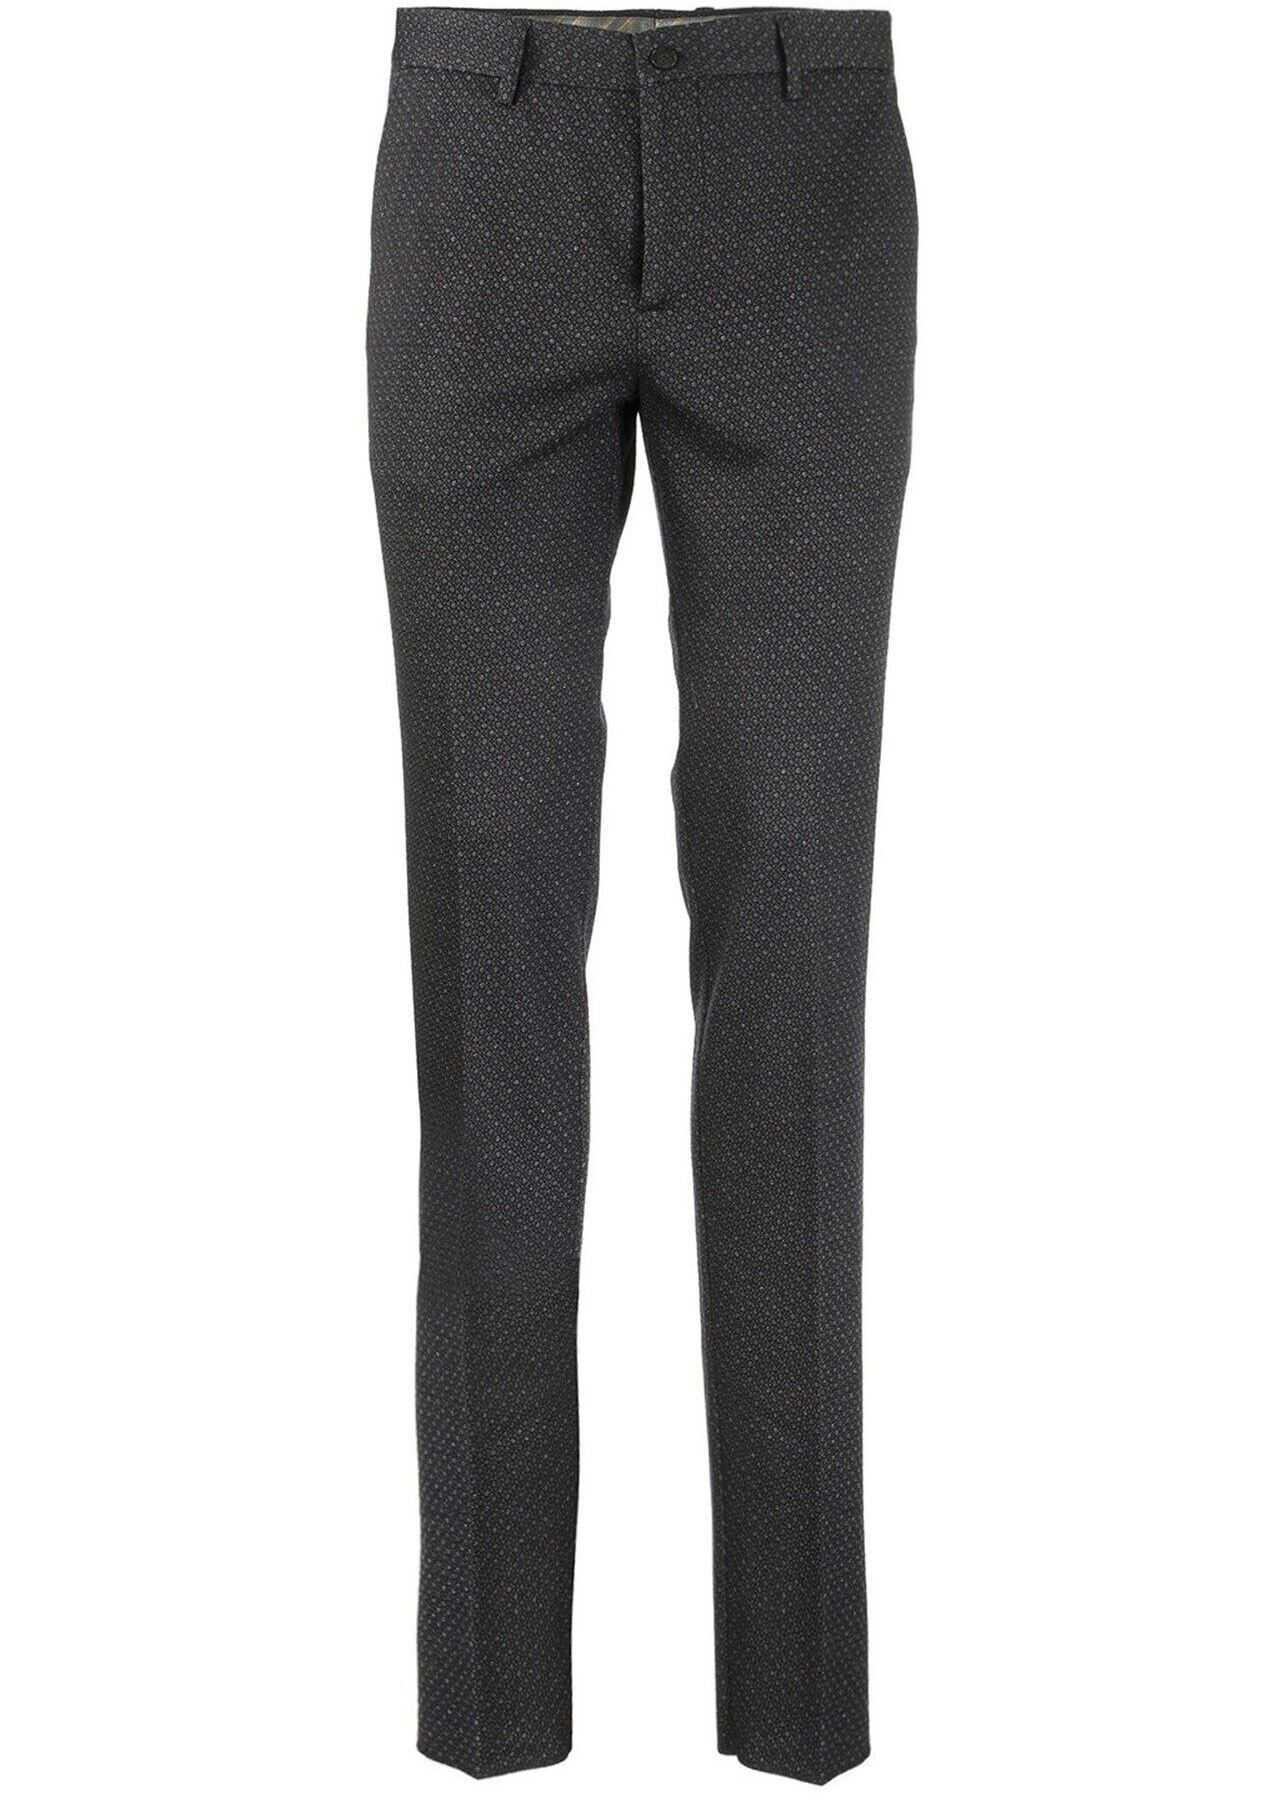 ETRO Cotton Wool Blend Pants In Blue Blue imagine